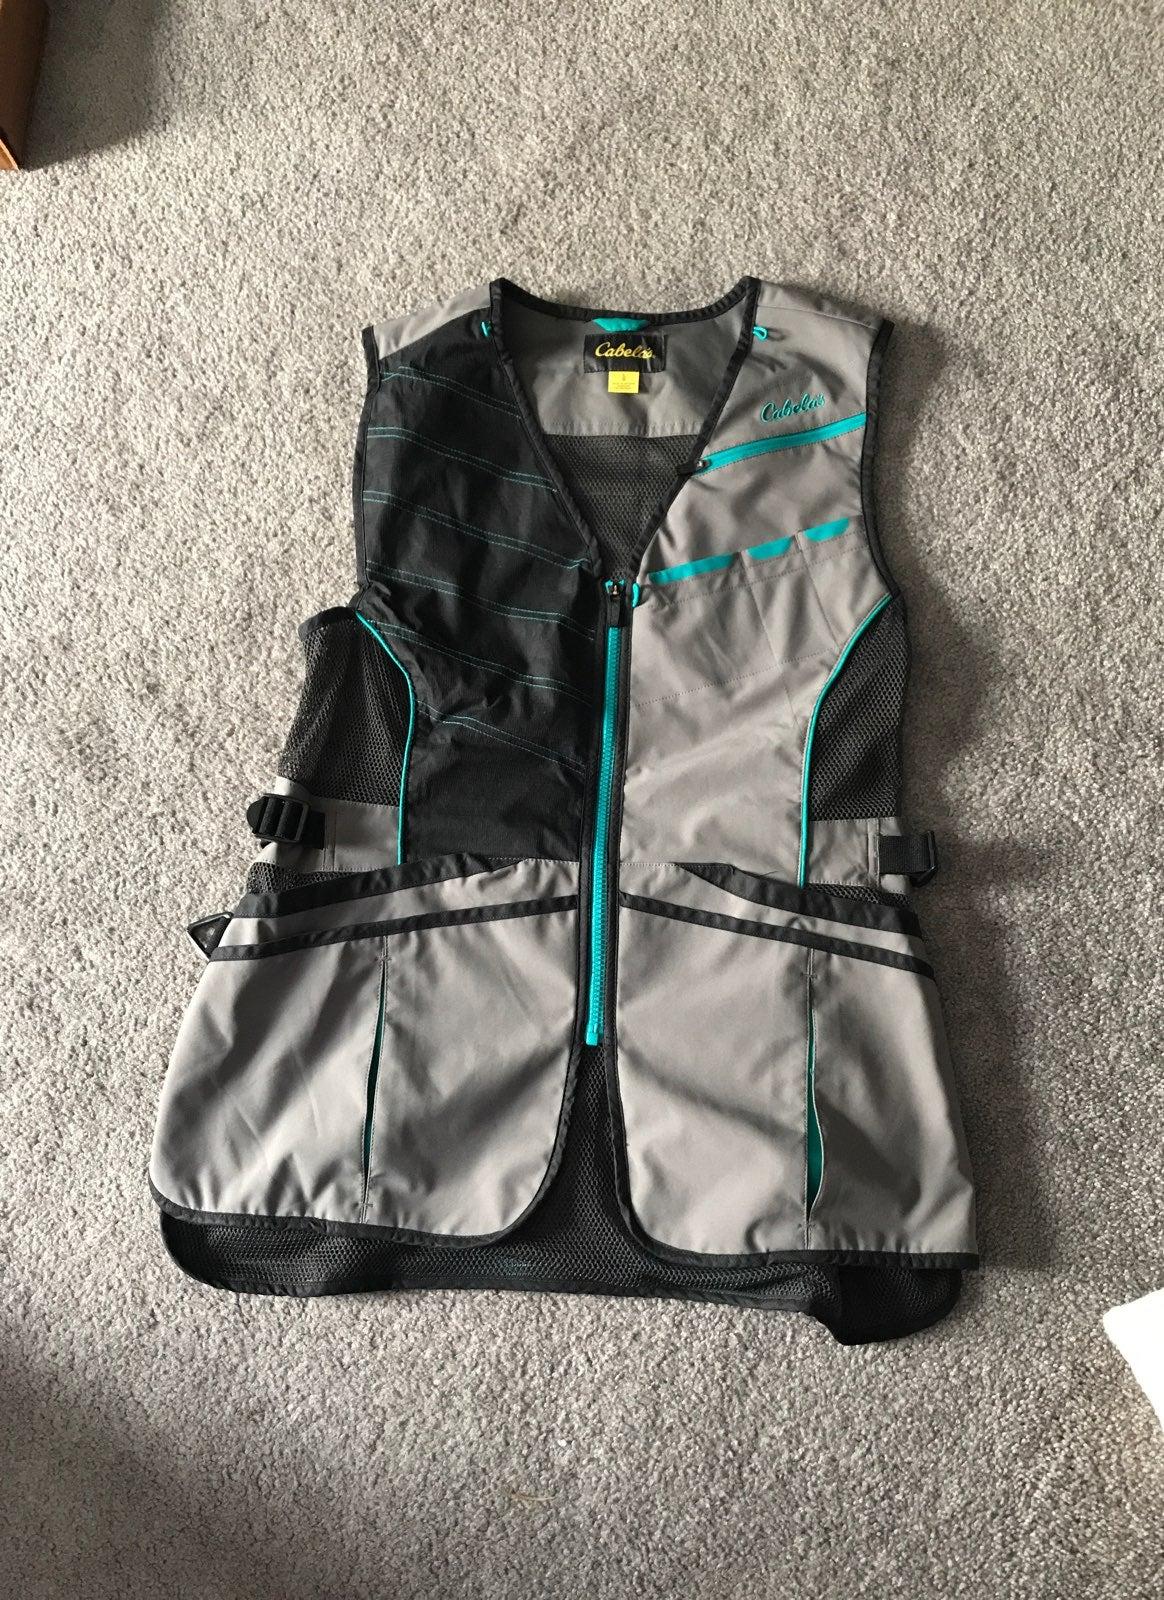 Cabela's Shooting Vest